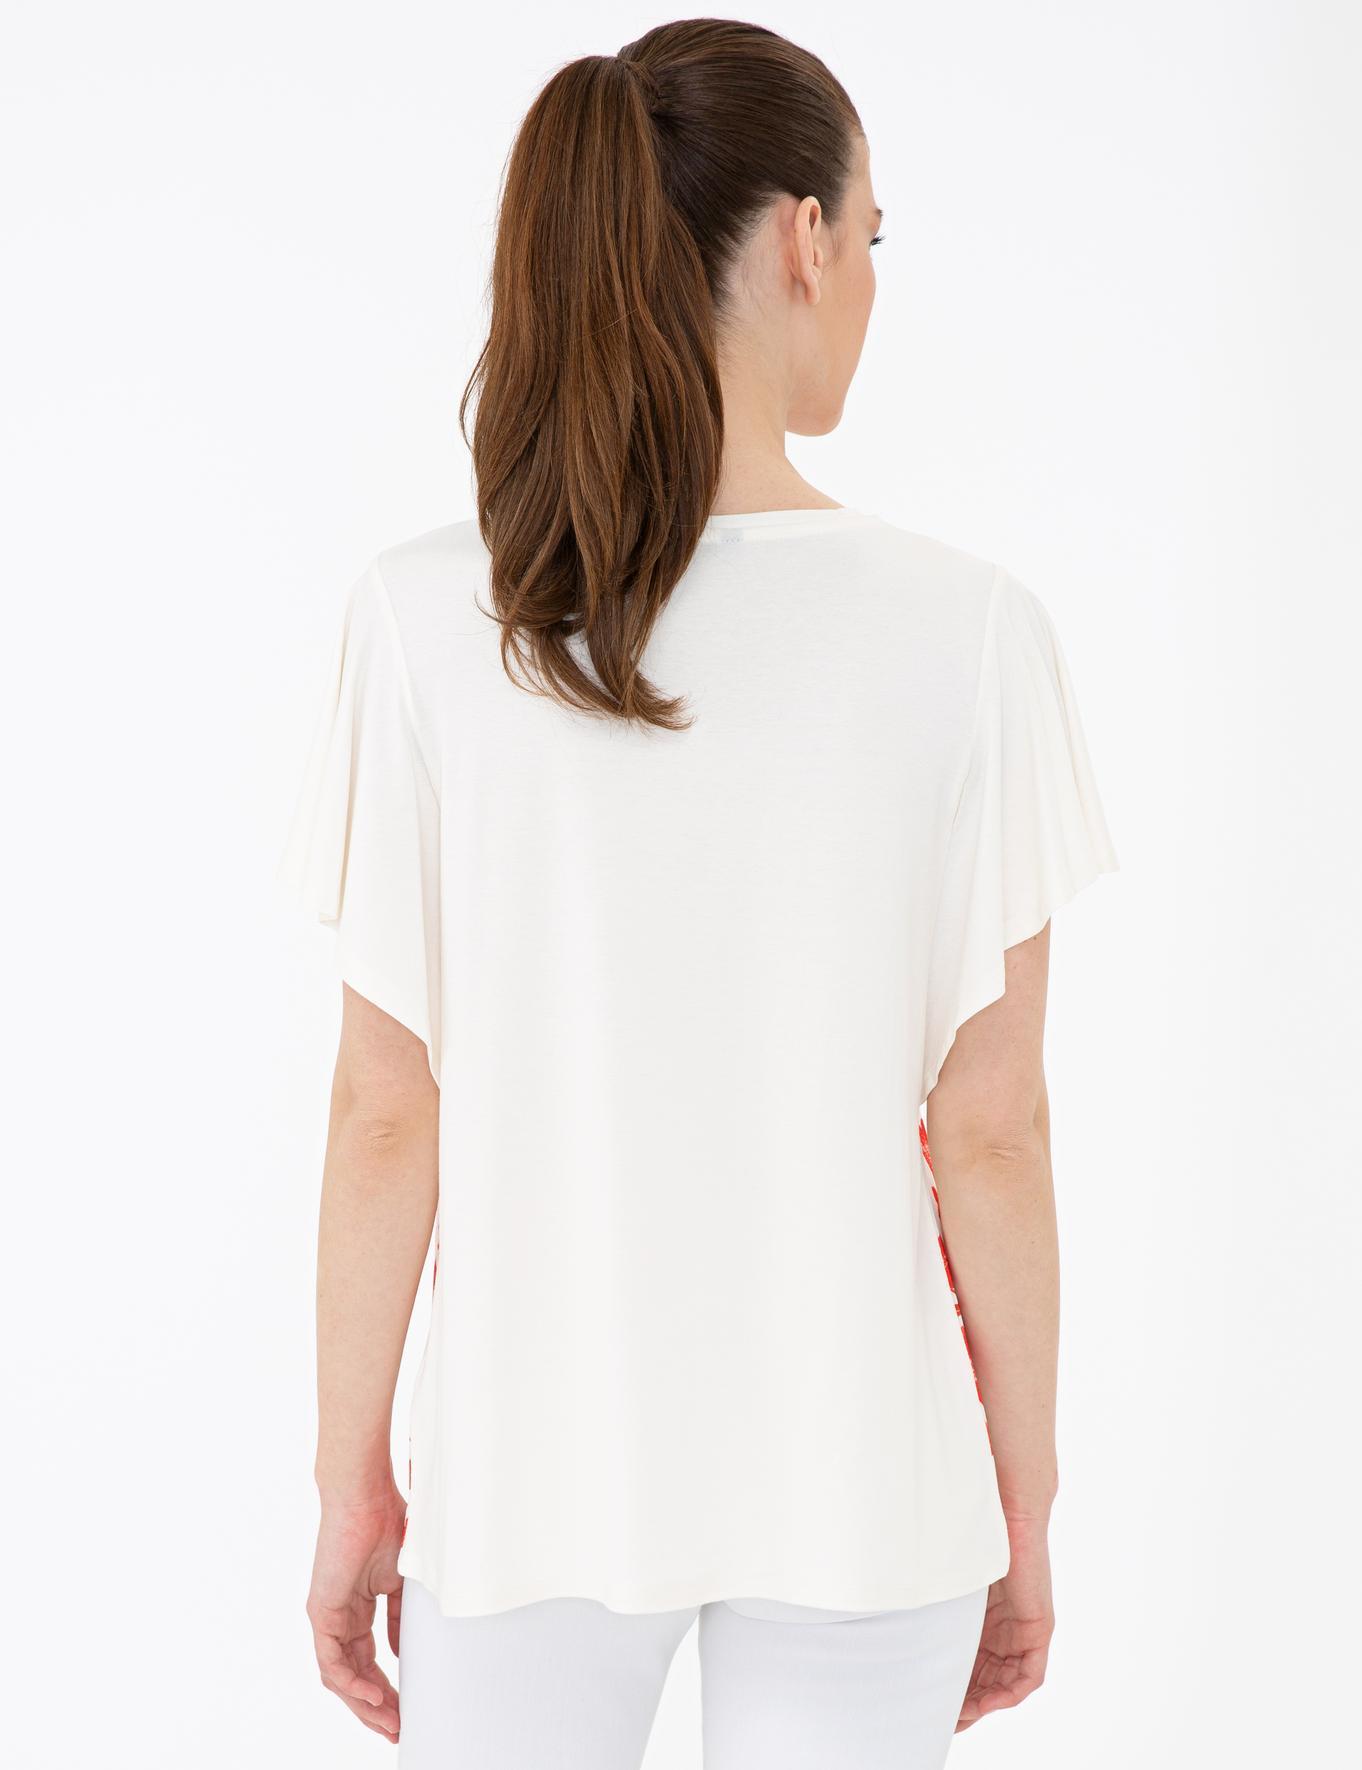 Nar Çiçeği Detaylı Beyaz Standart Fit T-Shirt